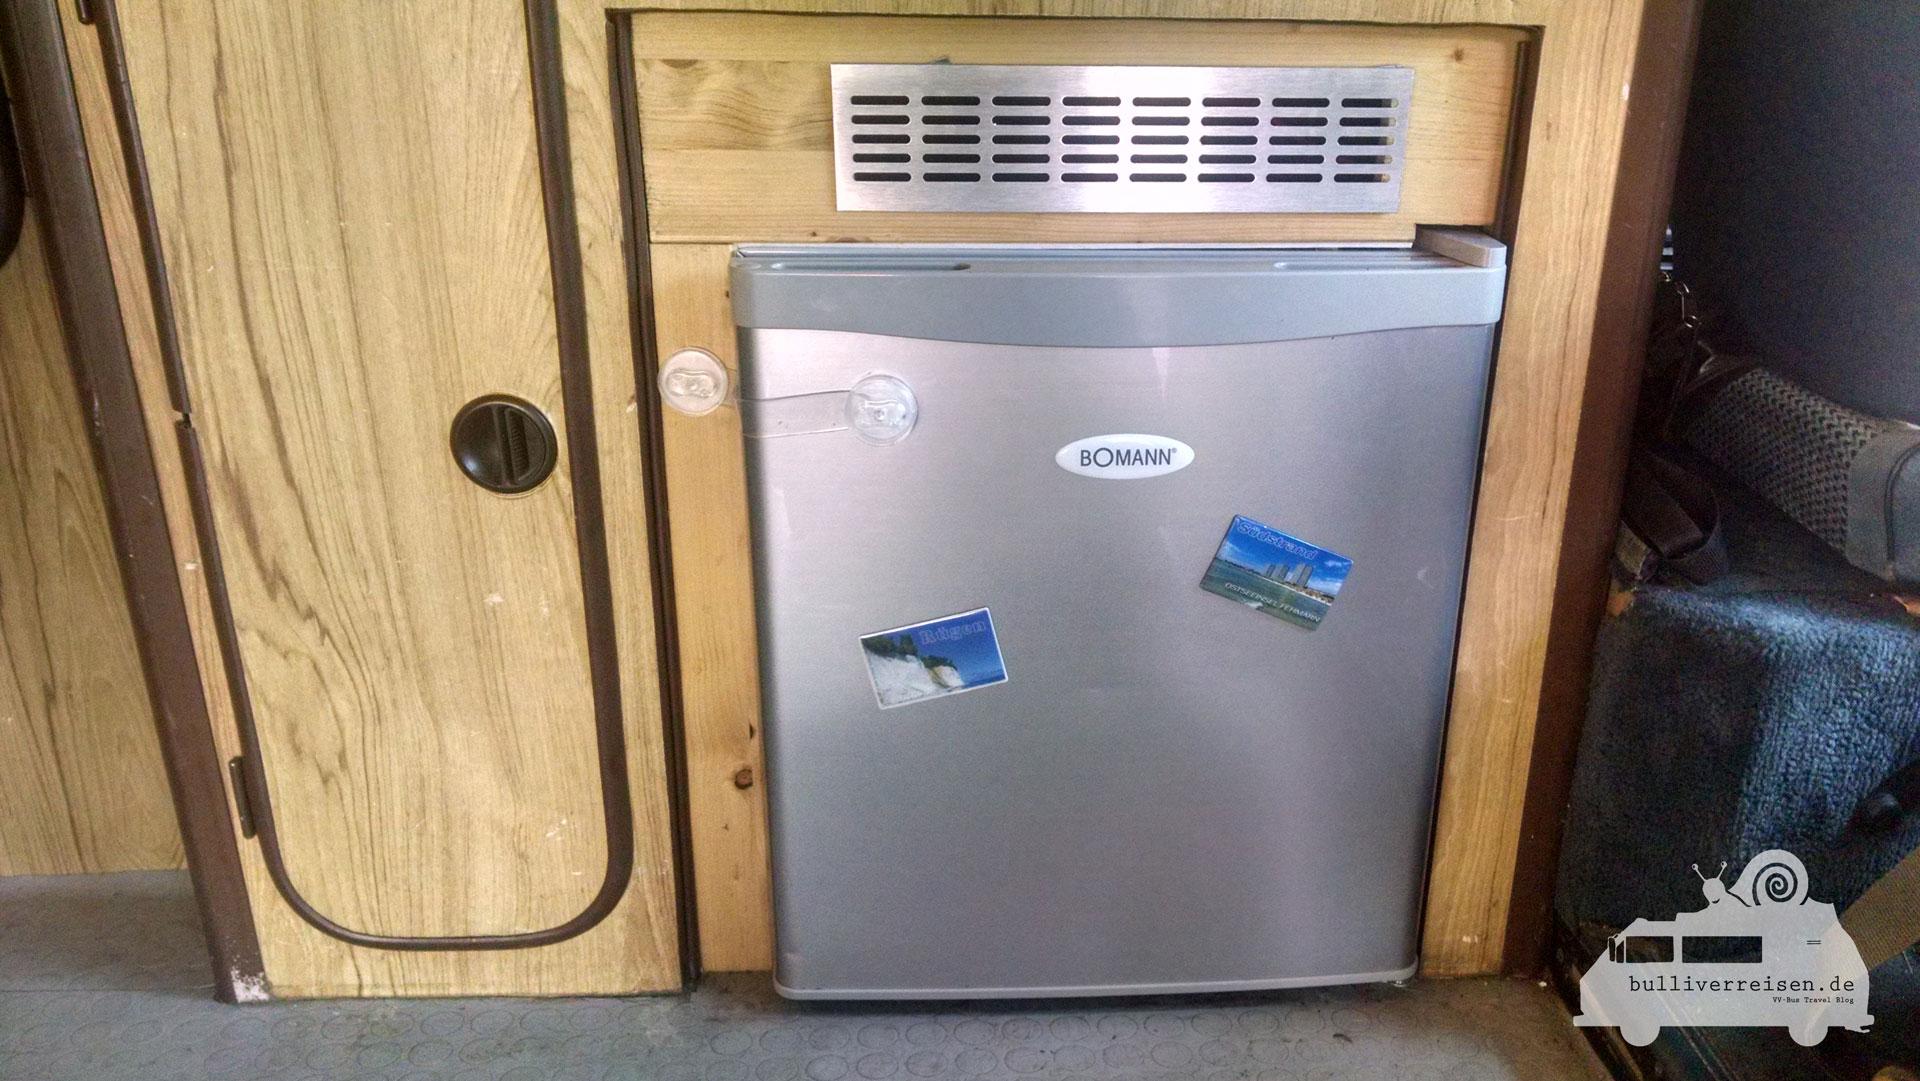 Bomann Kühlschrank Qualität : Kühlschrank für 220v im bus ⋆ reiseblog bulli verreisen